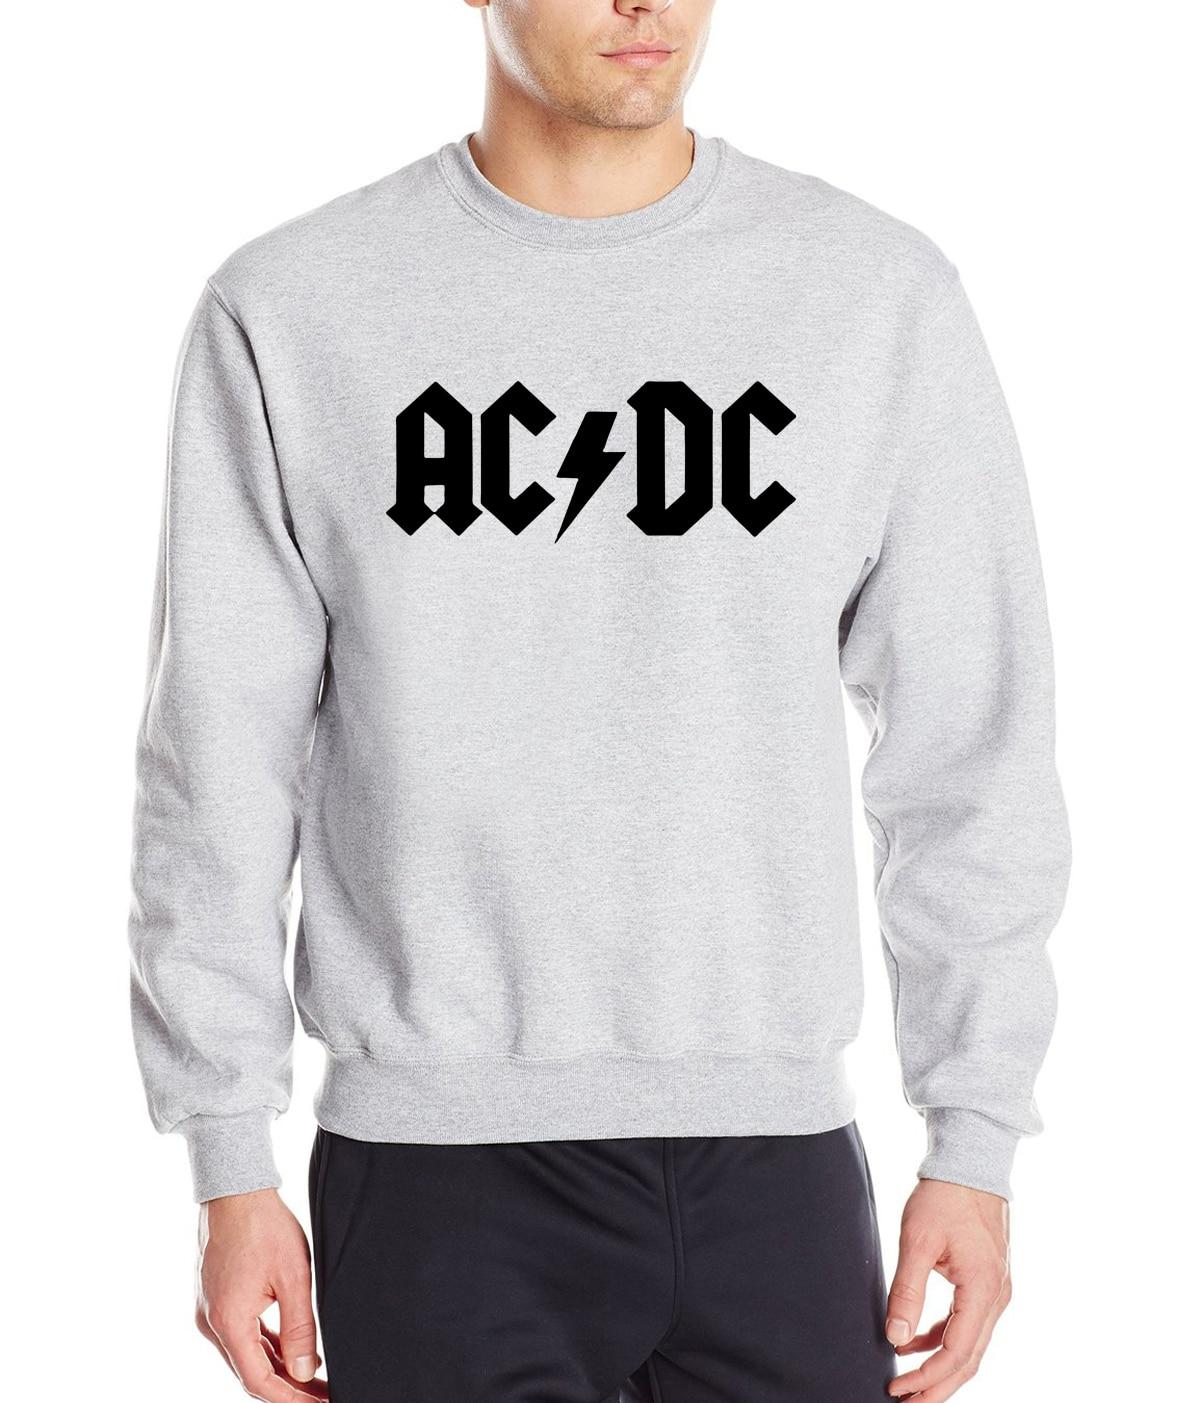 hip-hop-tarz-streetwear-ac-fontbdc-b-font-band-kaya-erkekler-sweatshirt-2017-yeni-sonbahar-k-moda-ho